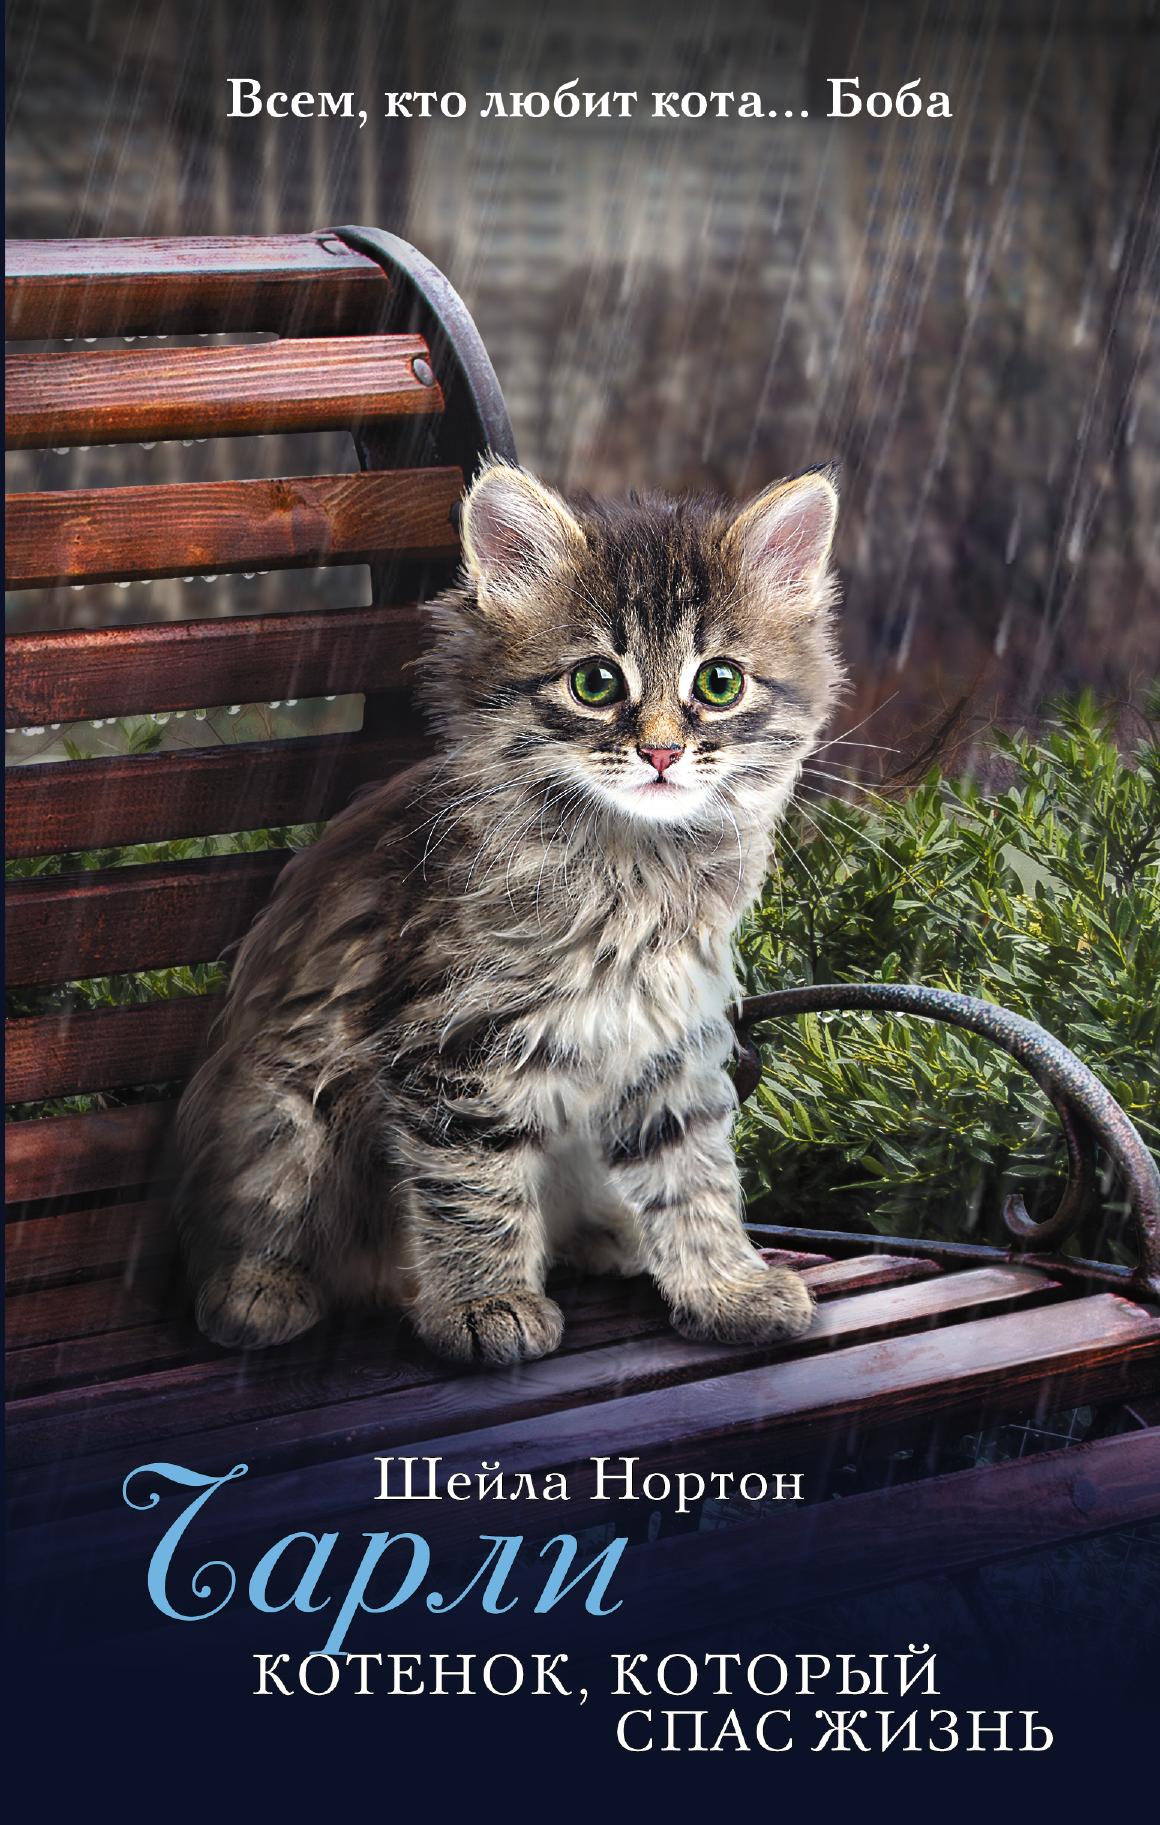 Нортон Ш. Чарли. Котенок, который спас жизнь нортон ш чарли котенок который спас жизнь